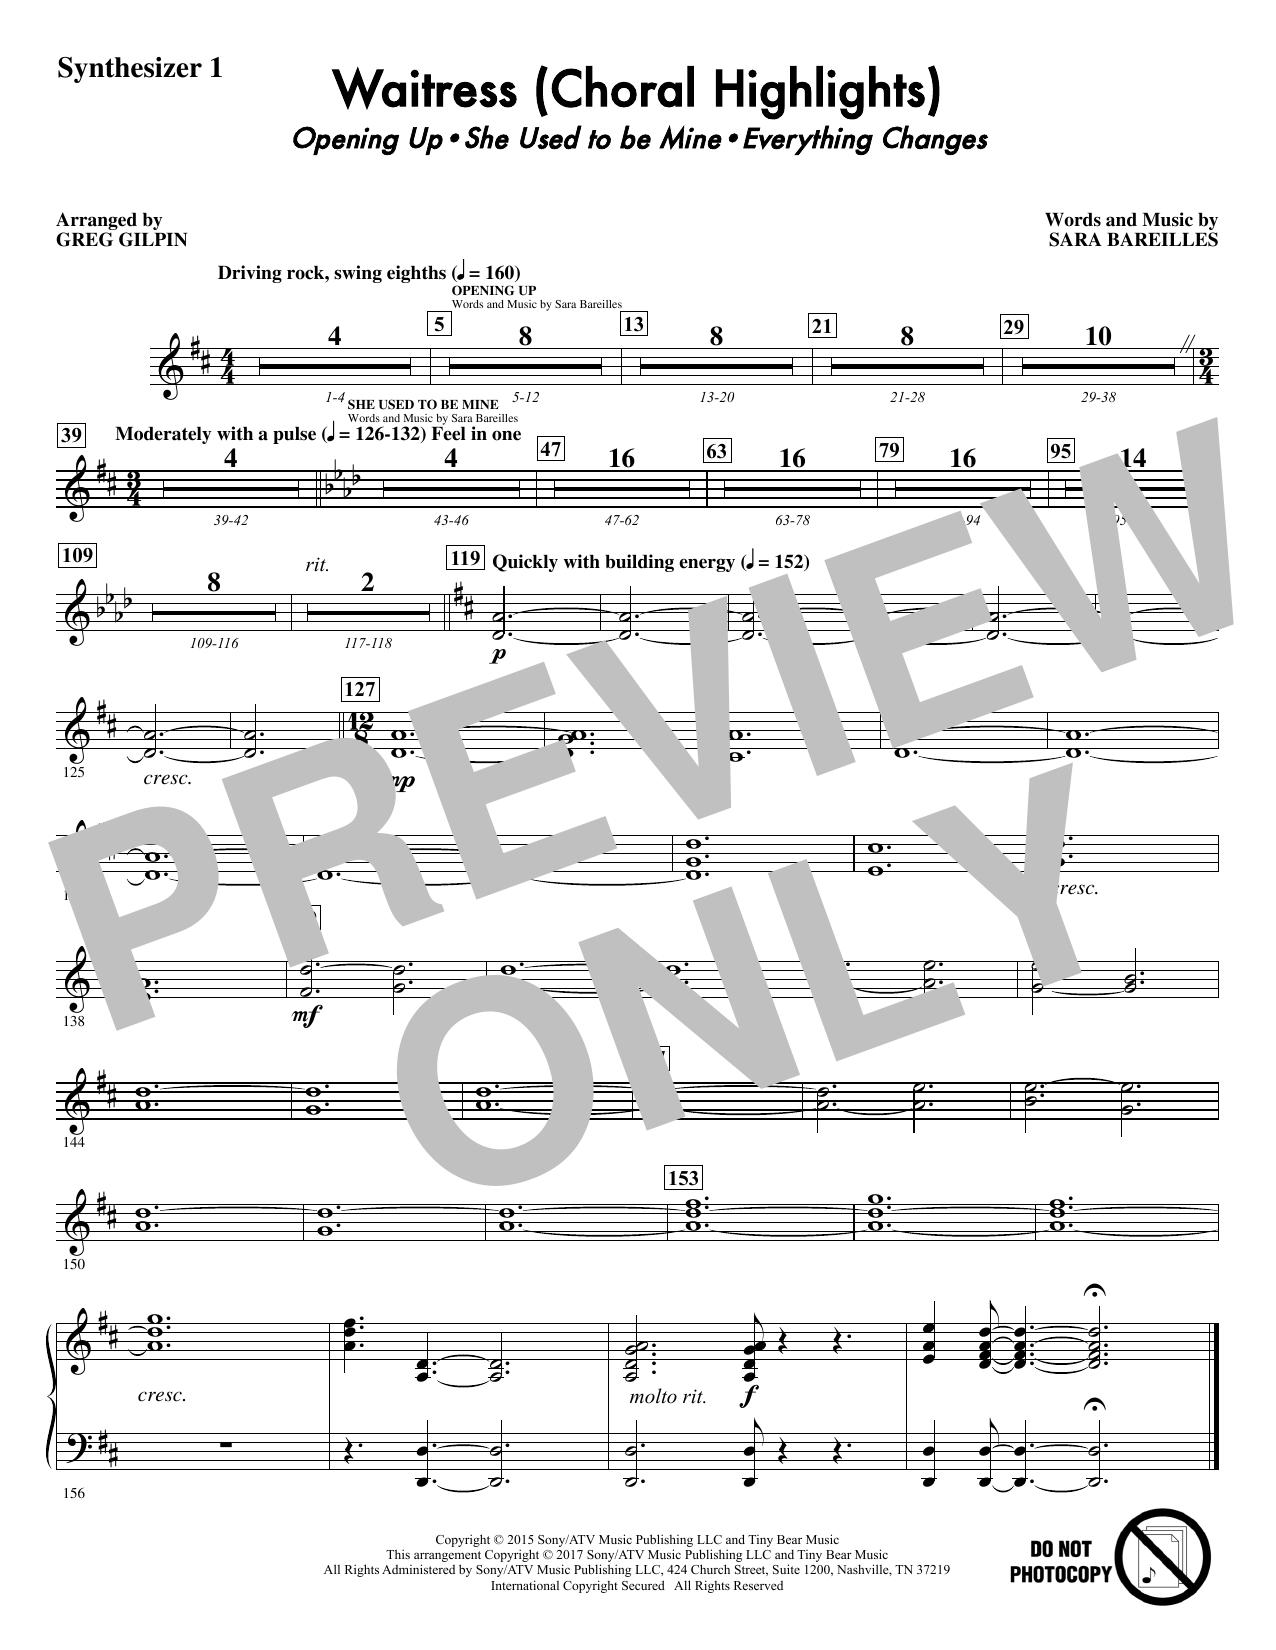 Waitress (Choral Highlights) (arr. Greg Gilpin) - Synthesizer I Sheet Music